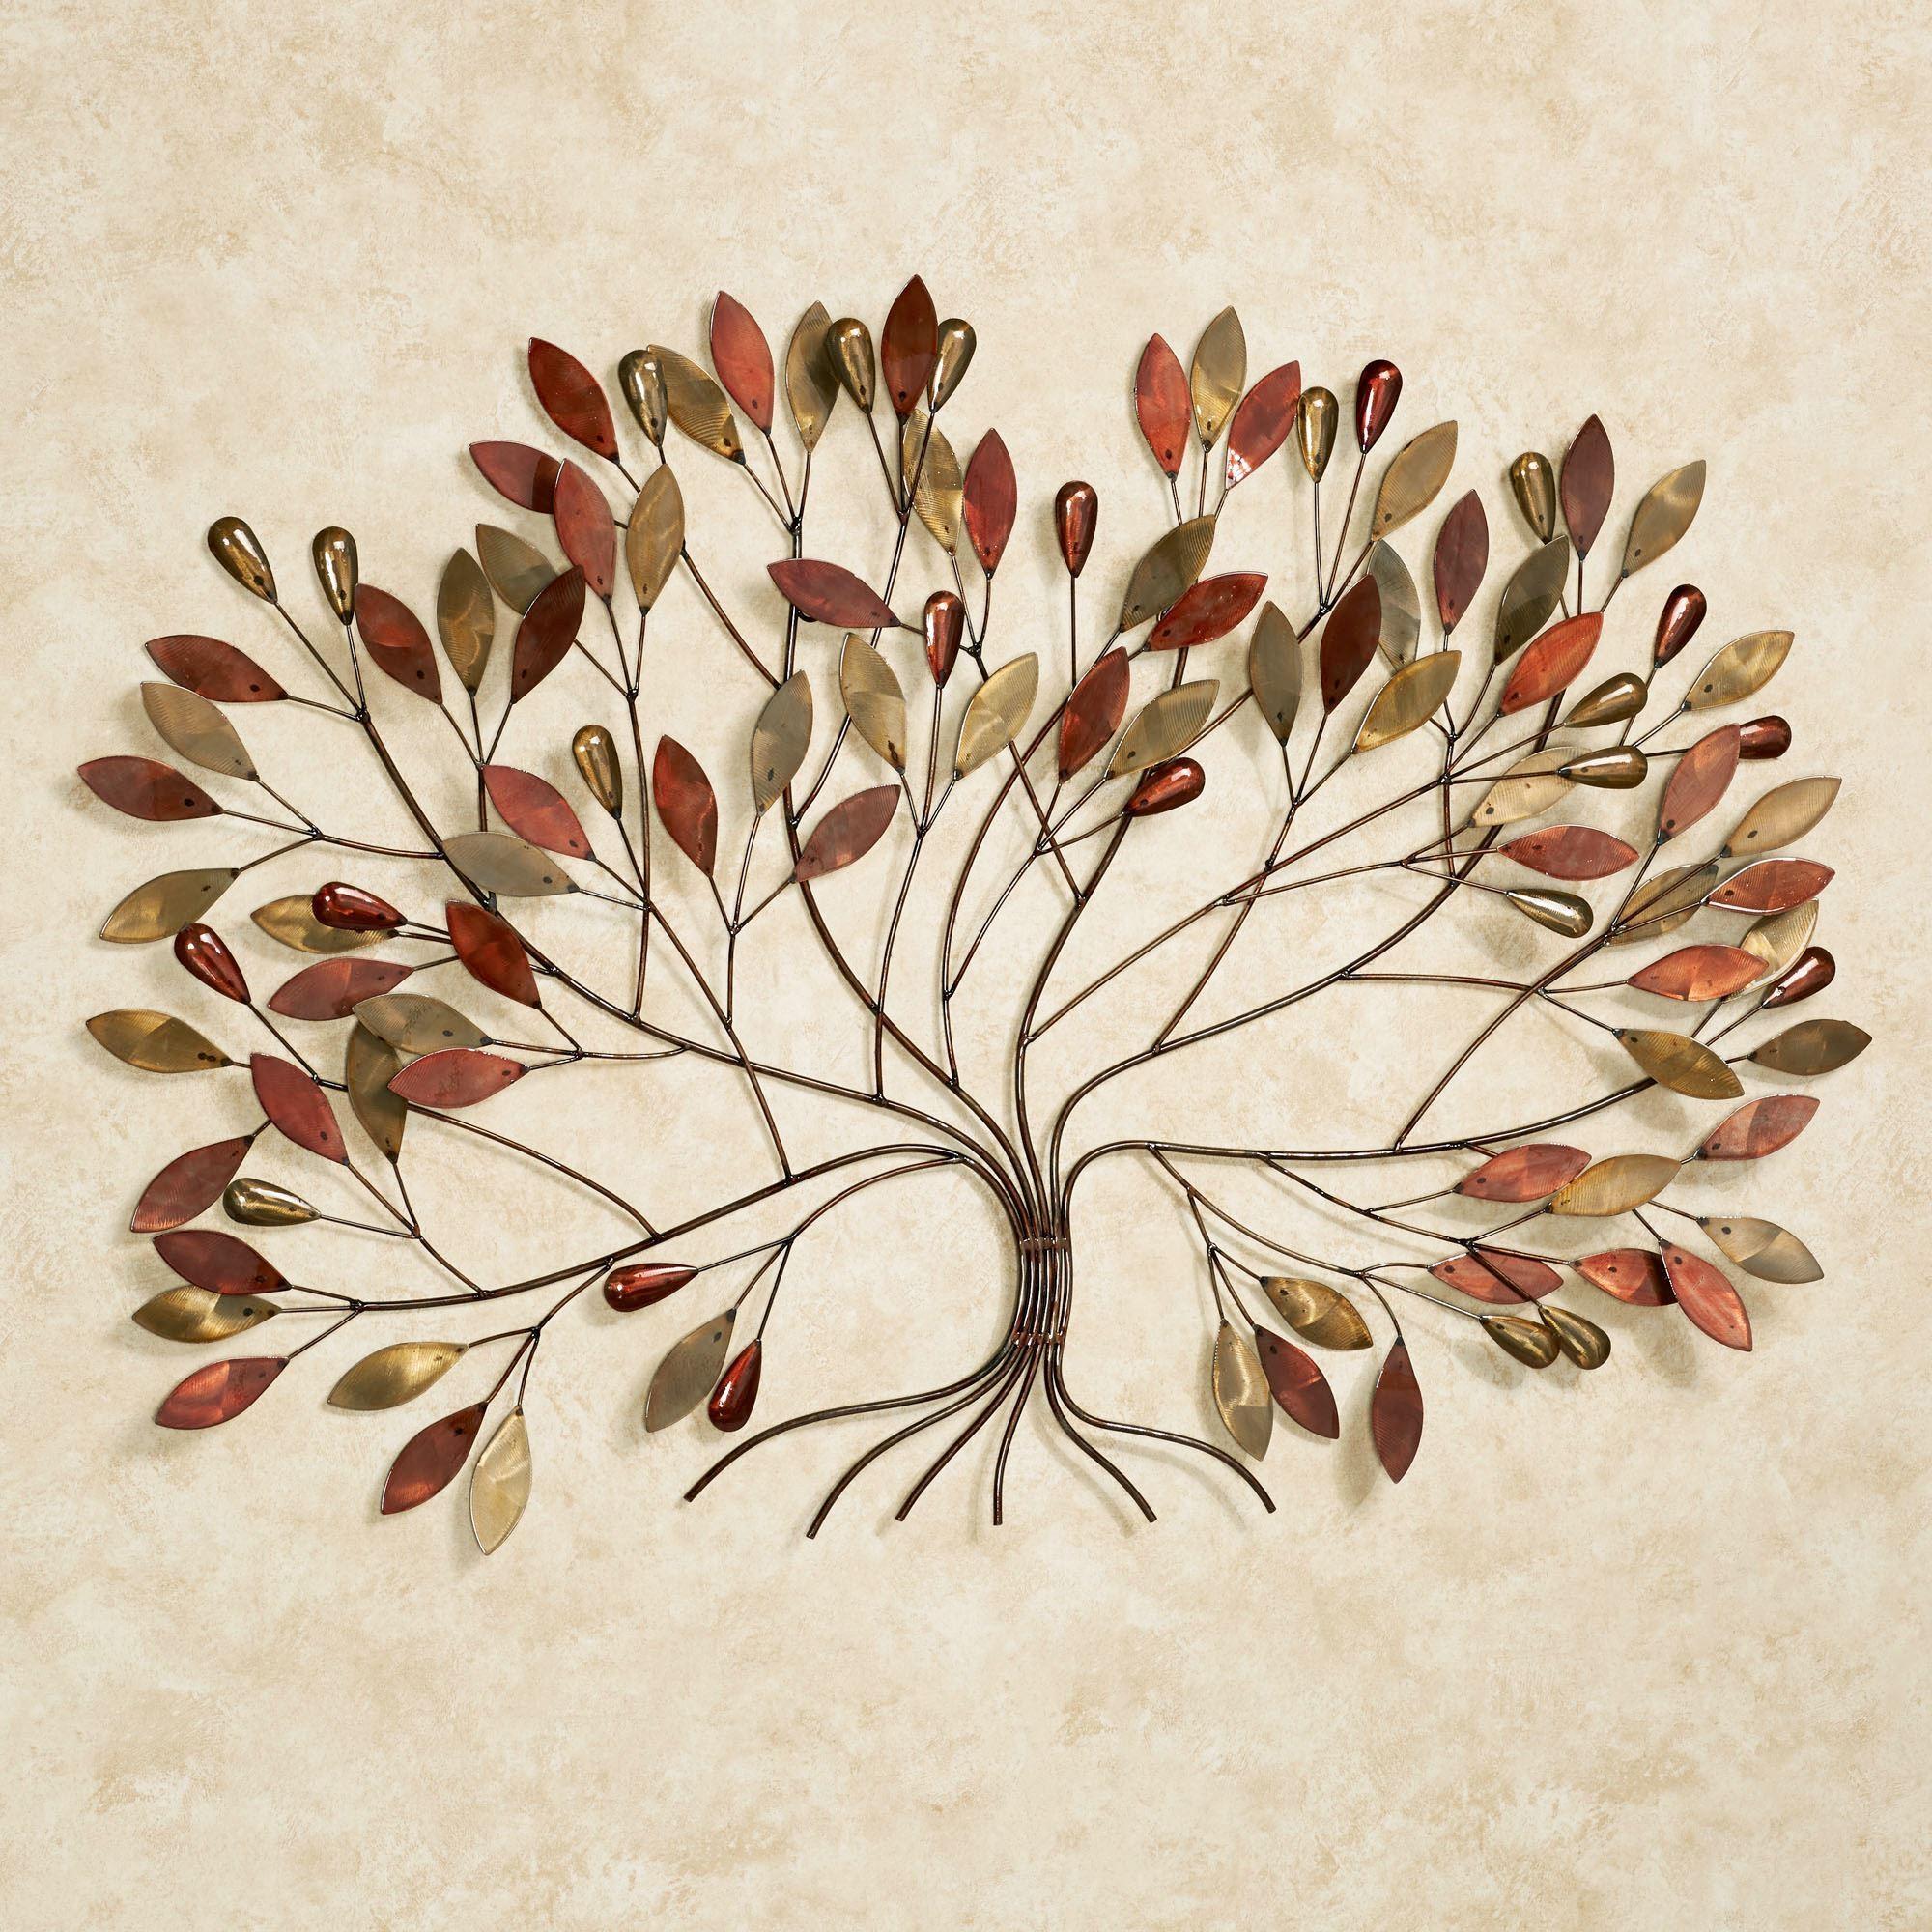 Wall Art, Metal Wall Art, Wooden Wall Art   Touch Of Class With Windy Oak Tree Metal Wall Art (View 15 of 20)